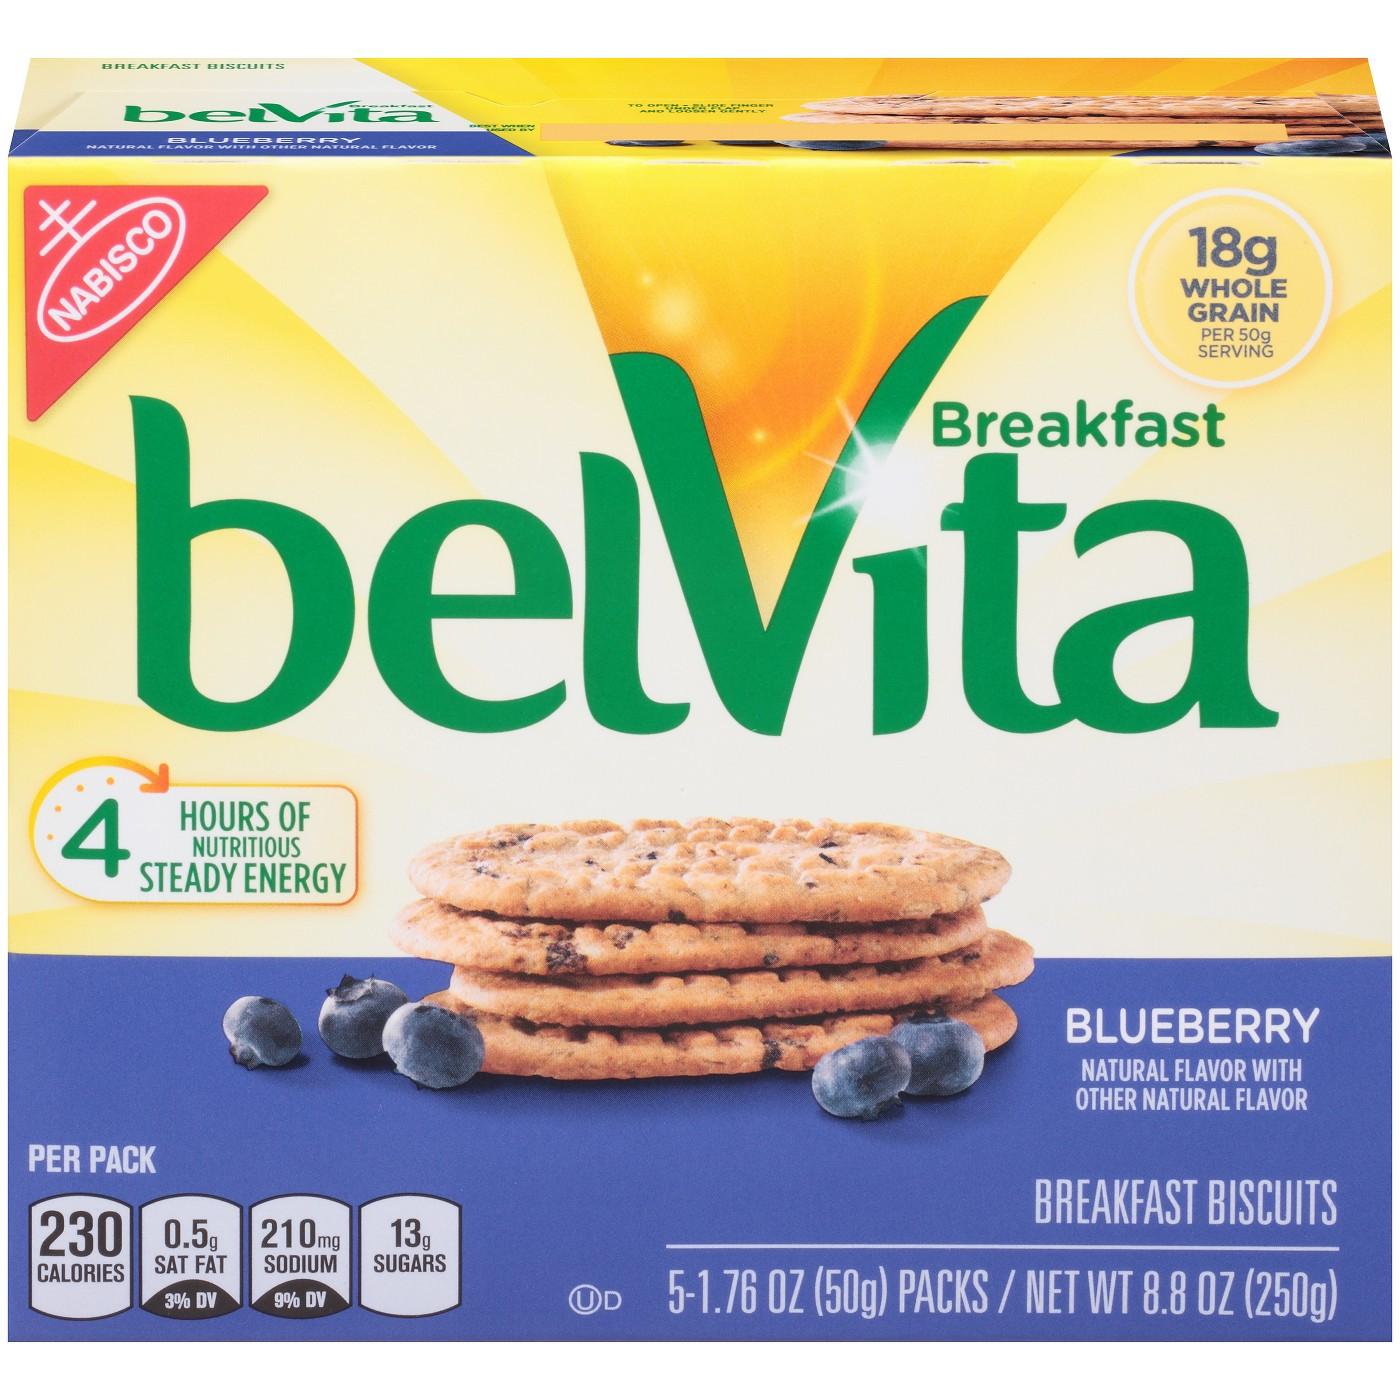 Belvita Blueberry Breakfast Biscuits - 8.8oz - image 1 of 7